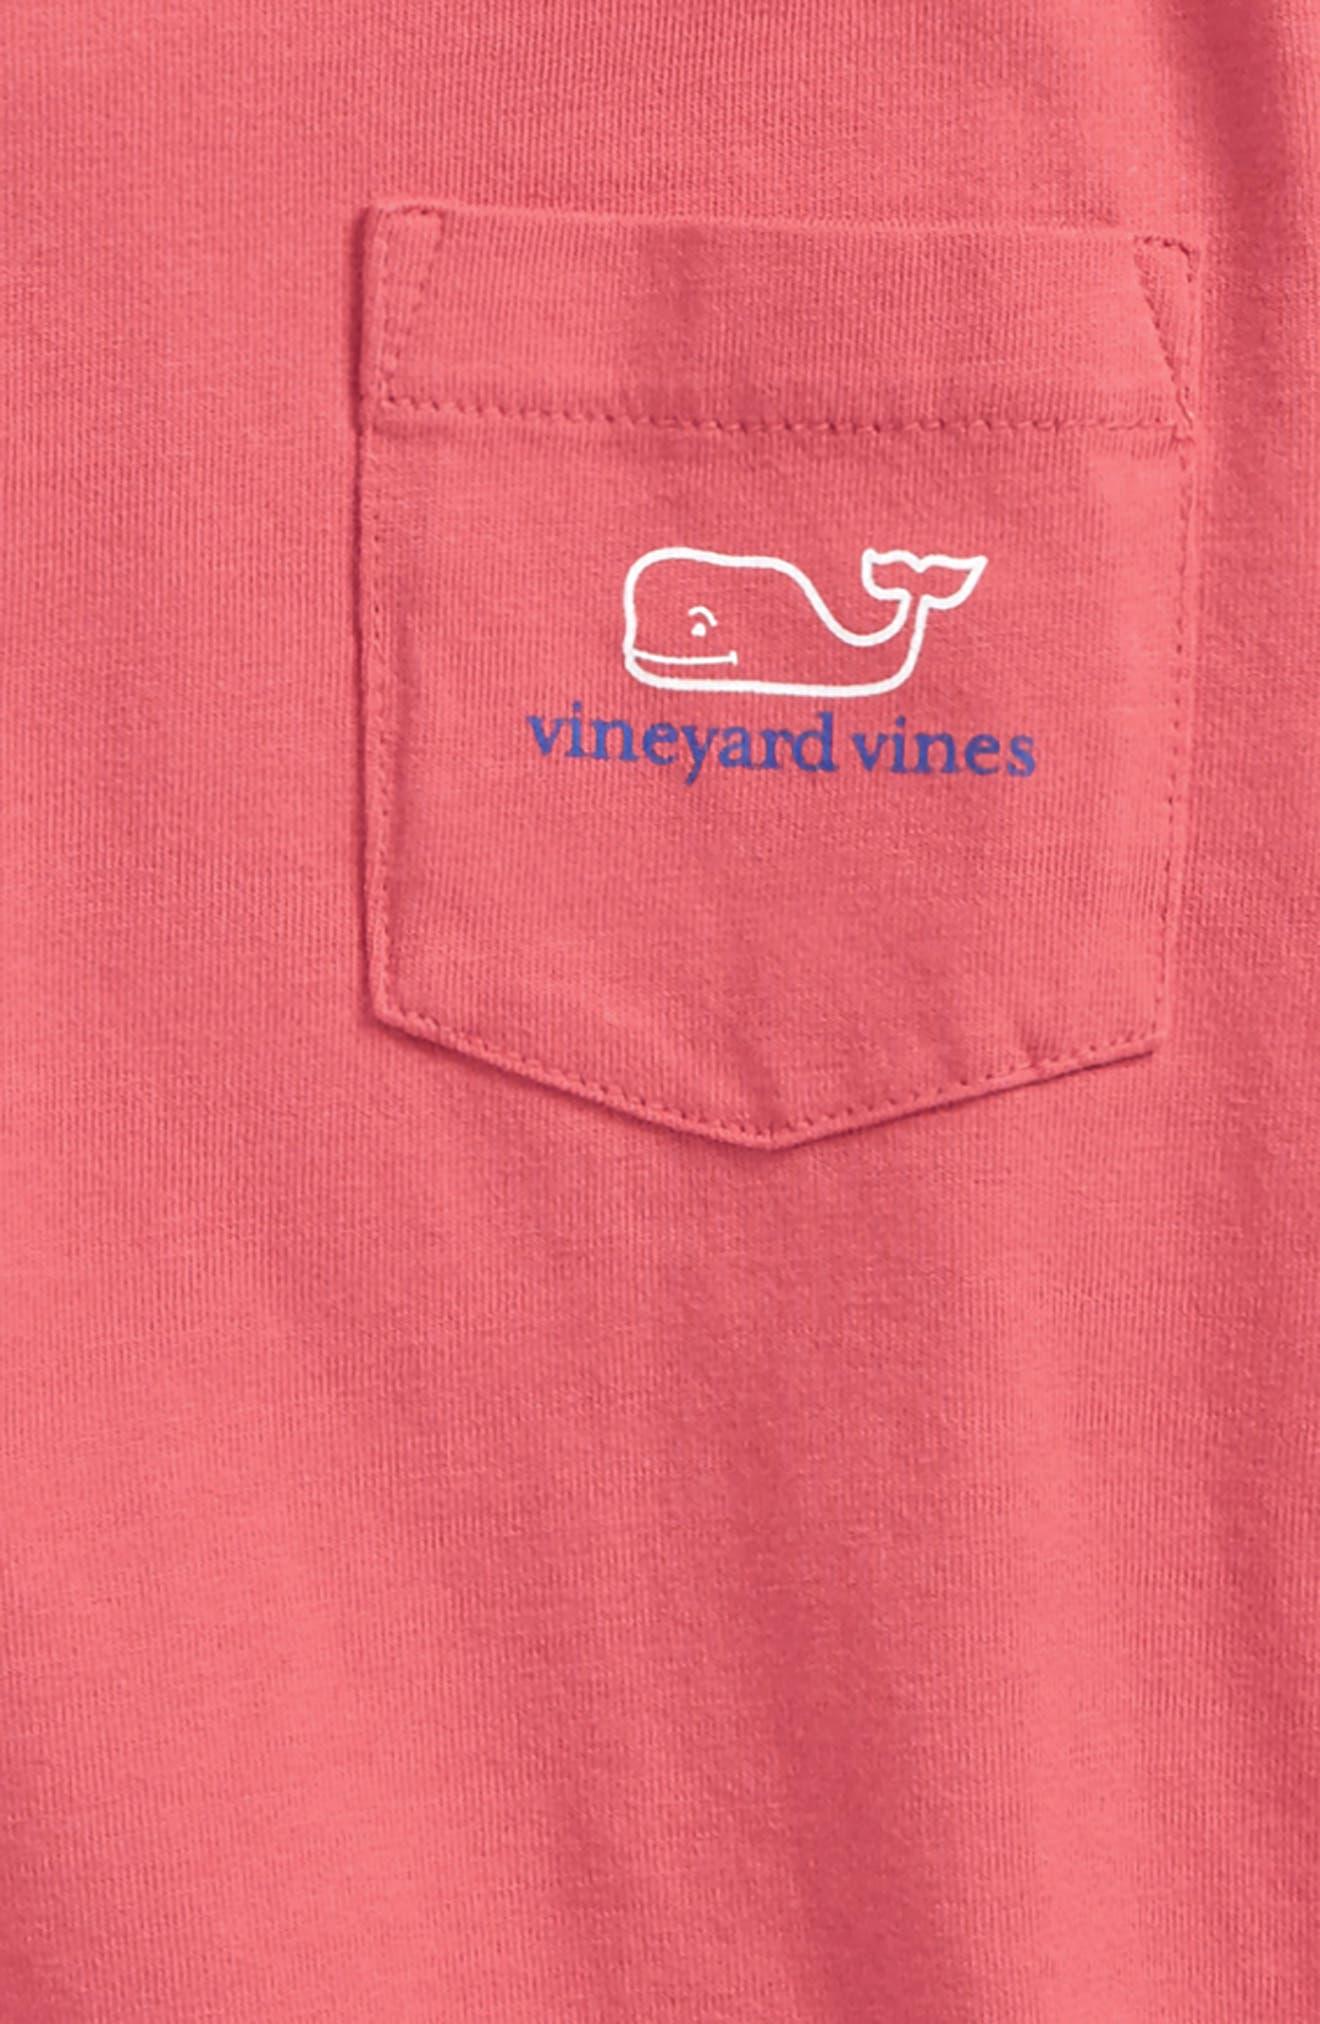 Alternate Image 3  - vineyard vines Two-Tone Whale Hooded T-Shirt (Toddler Boys & Little Boys)